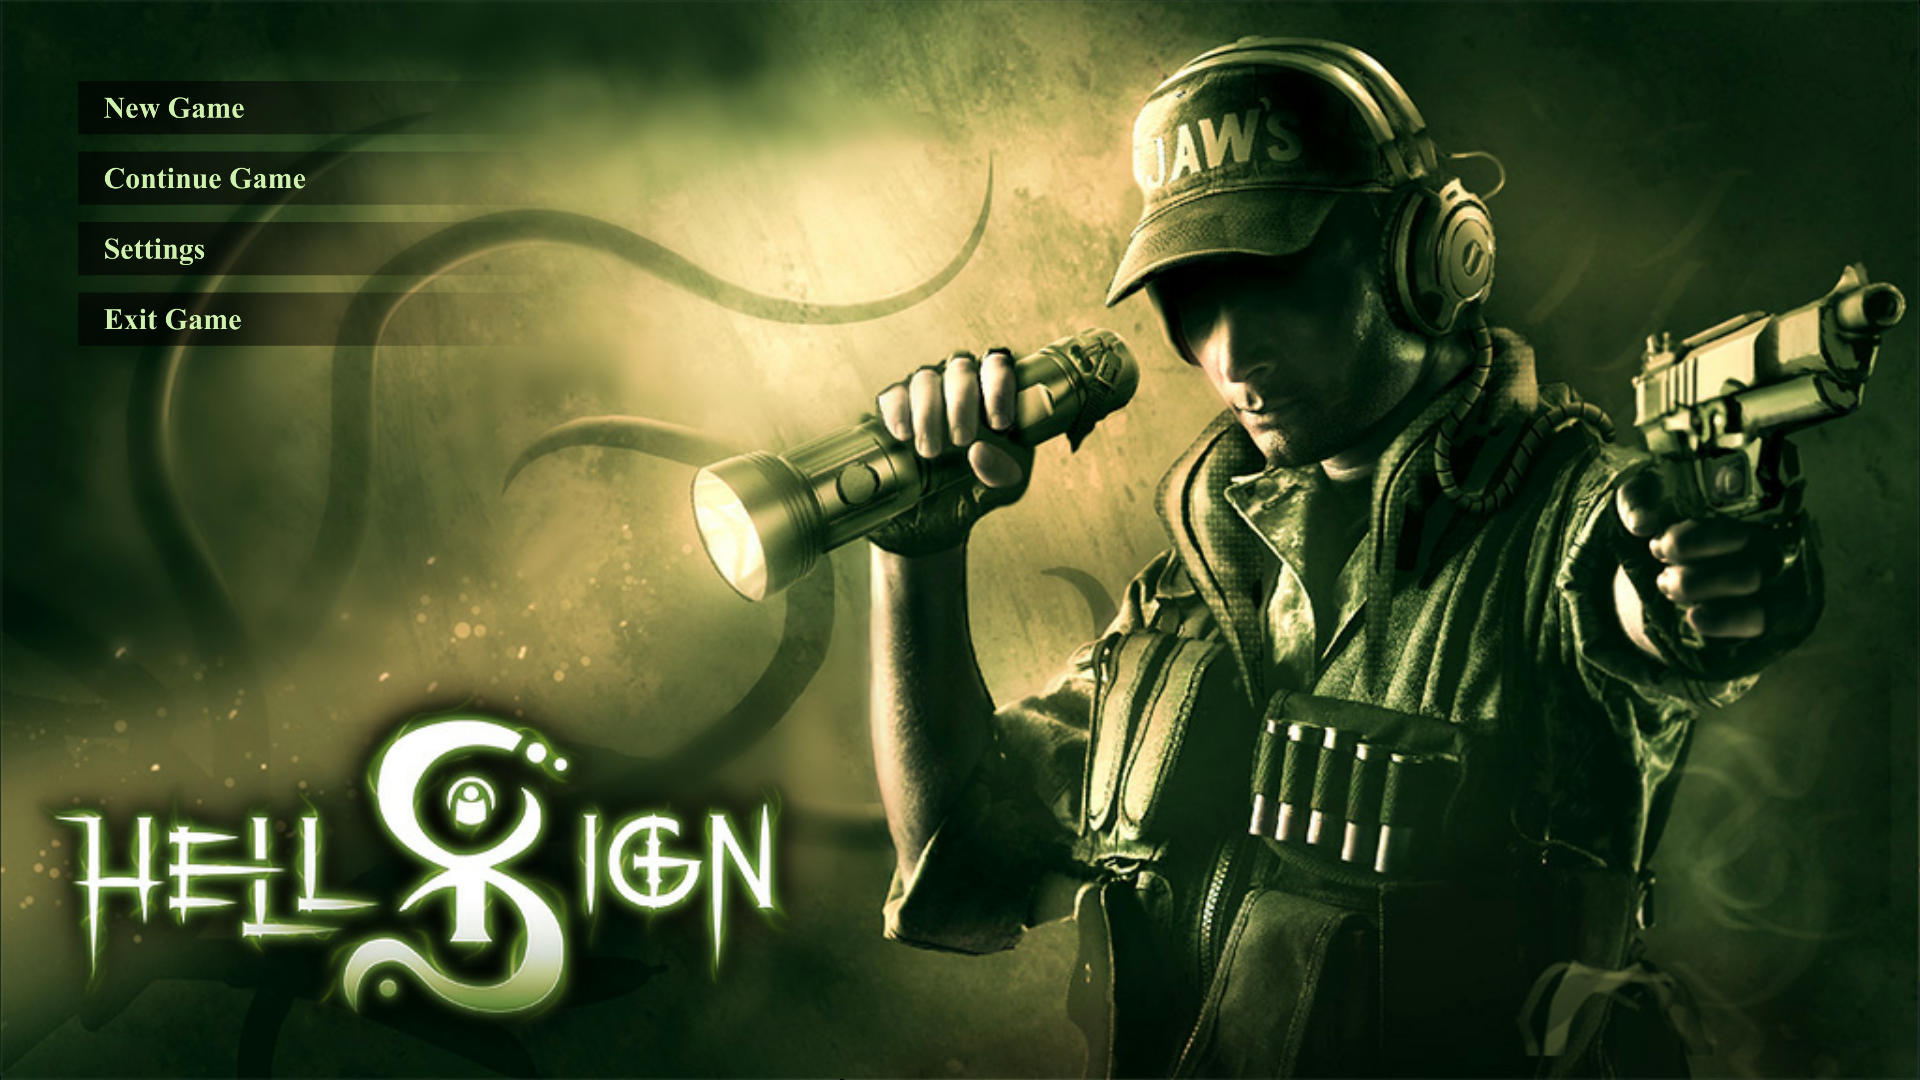 بررسی نسخه Early access بازی Hellsign